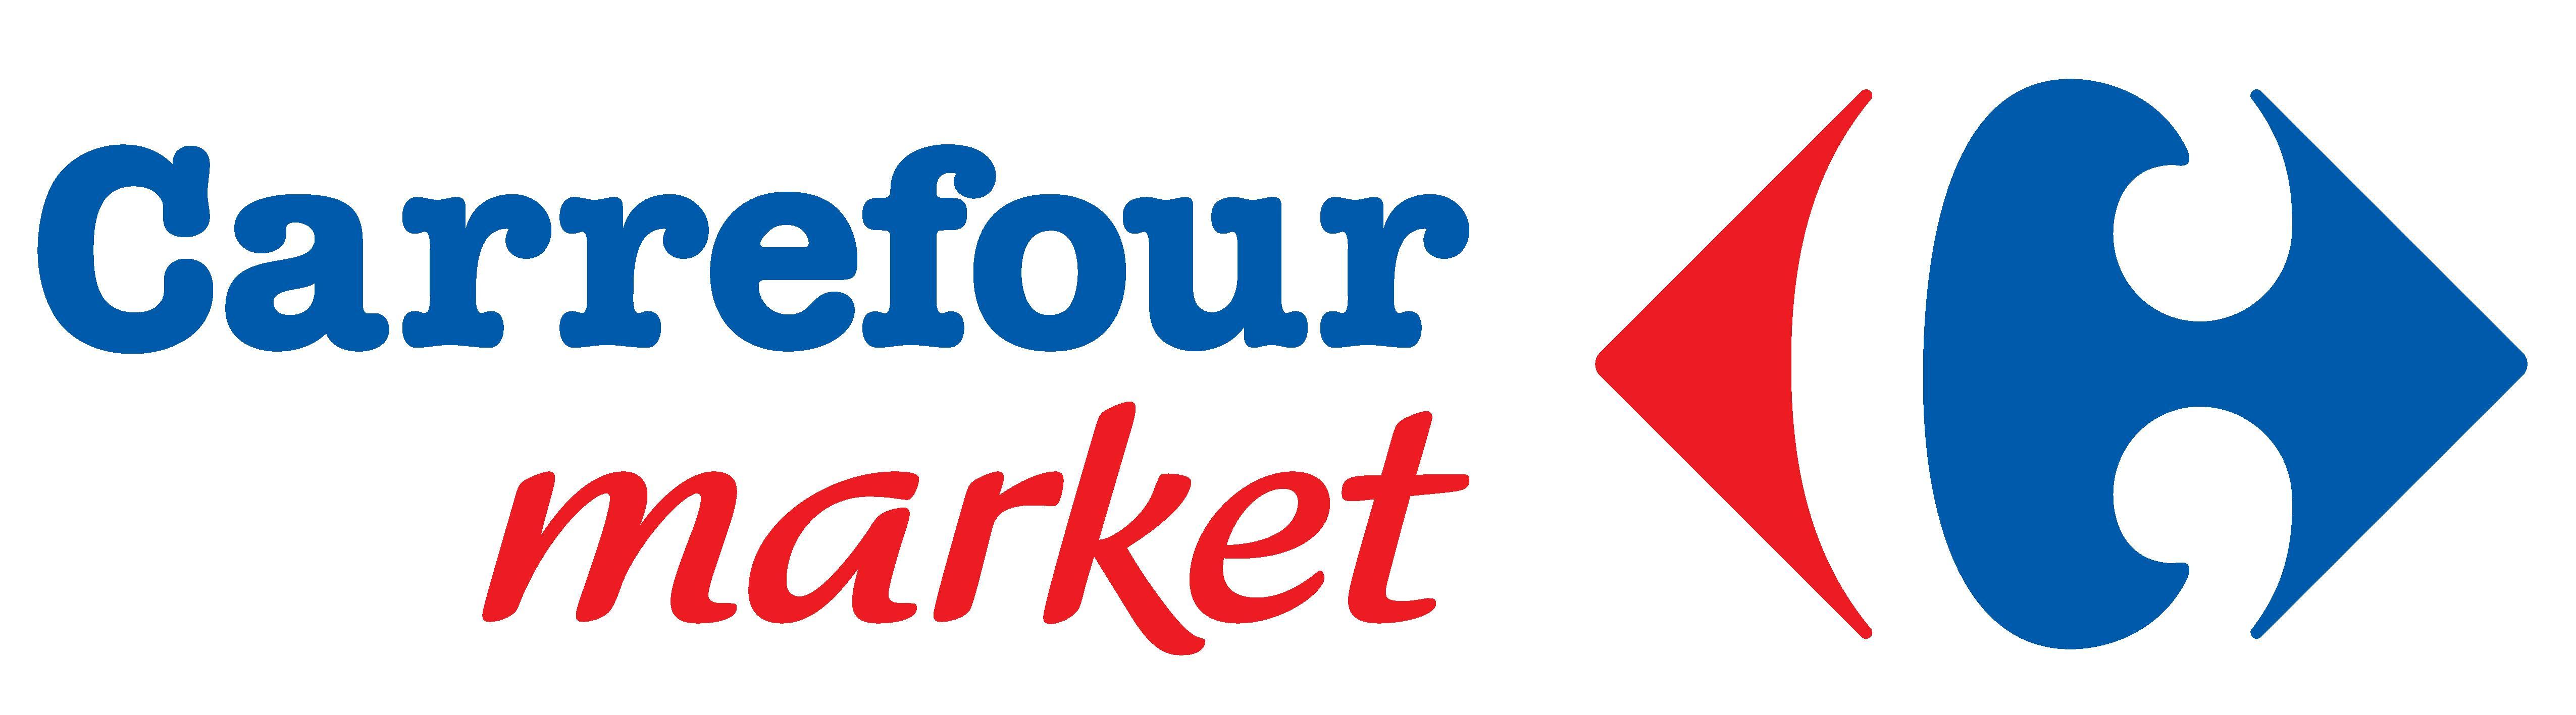 carrefour-market-logo